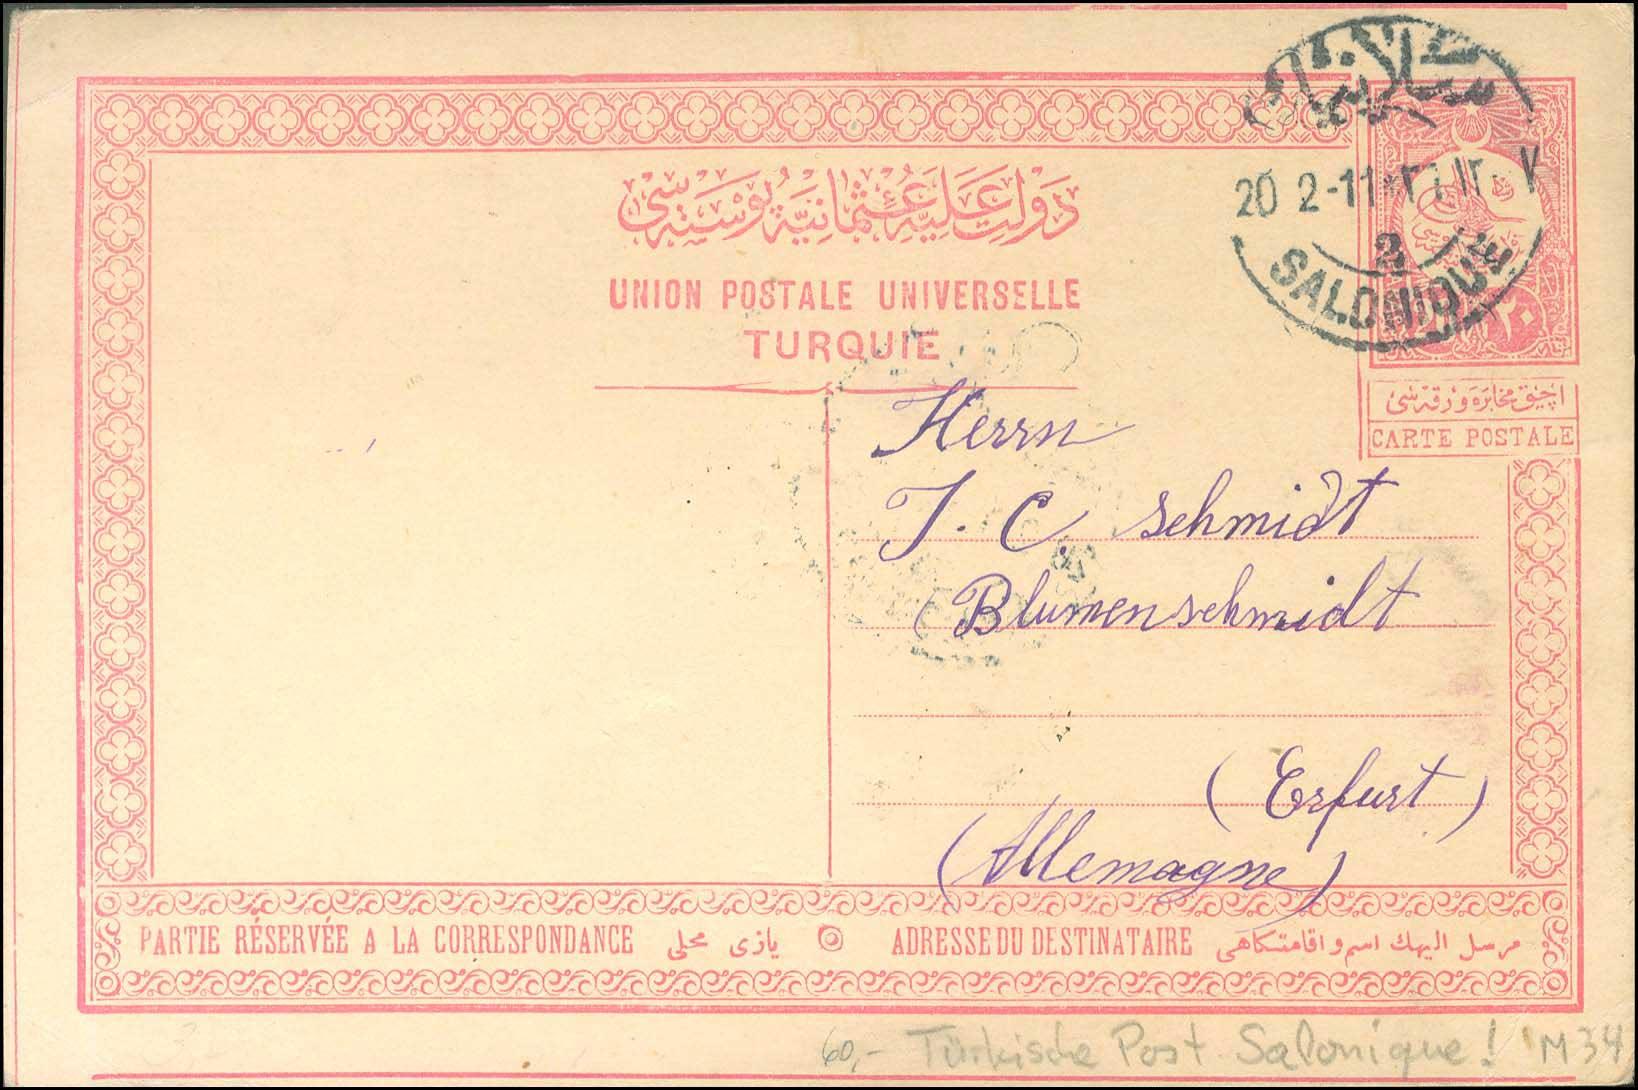 Lot 666 - -  THESSALONIKI (SALONICA) Thessaloniki (Salonica) -  A. Karamitsos Postal & Live Internet Auction 678 General Philatelic Auction